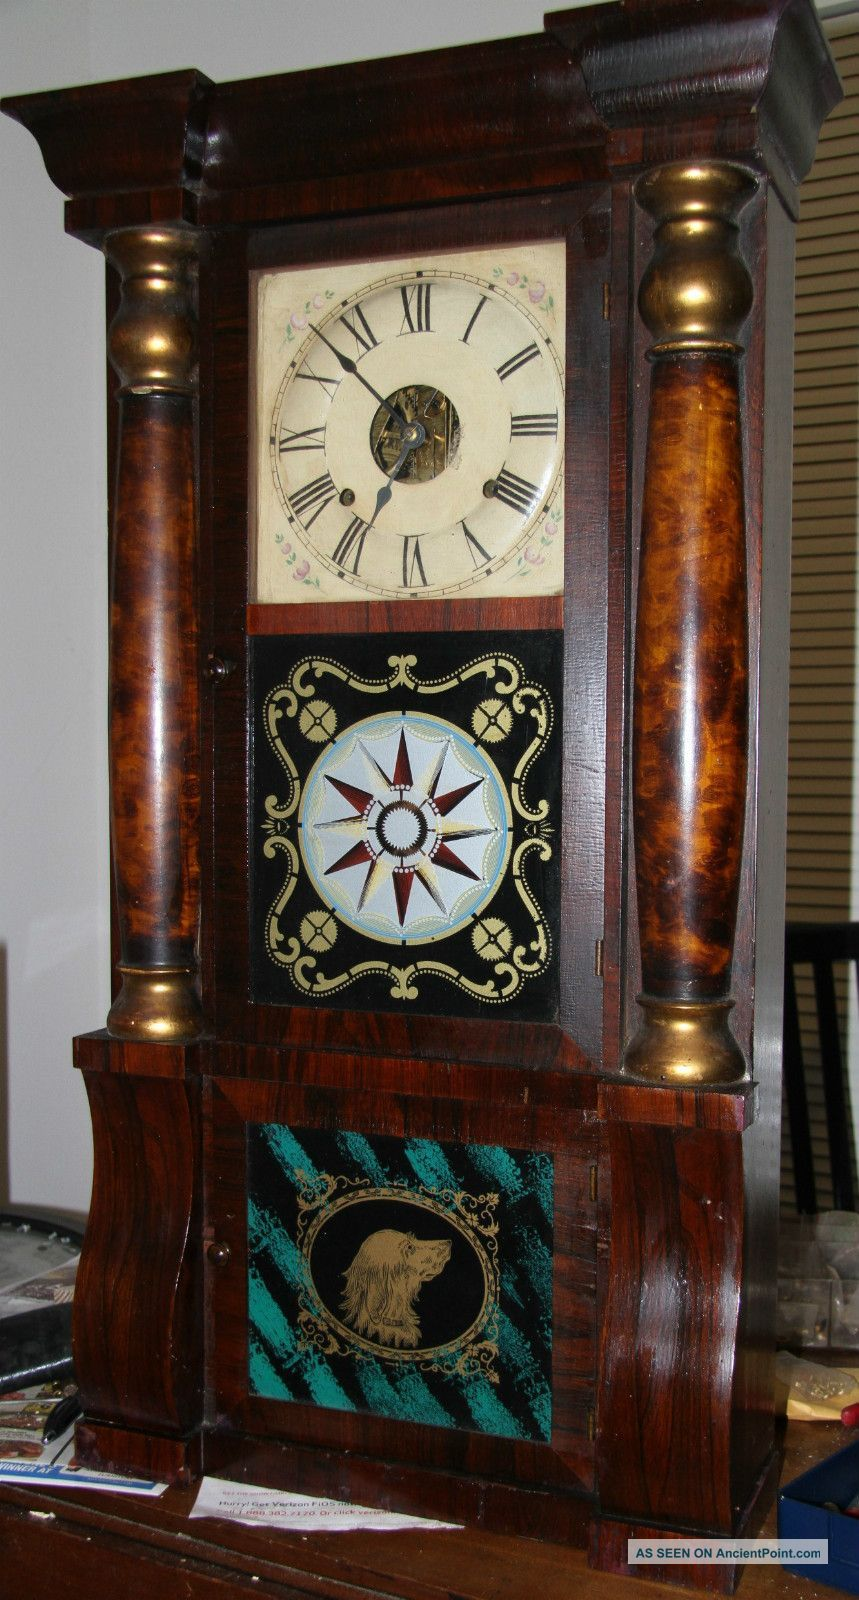 Magnificent Seth Thomas Shelf Clock - Weight Clocks photohttp://ancientpoint.com/